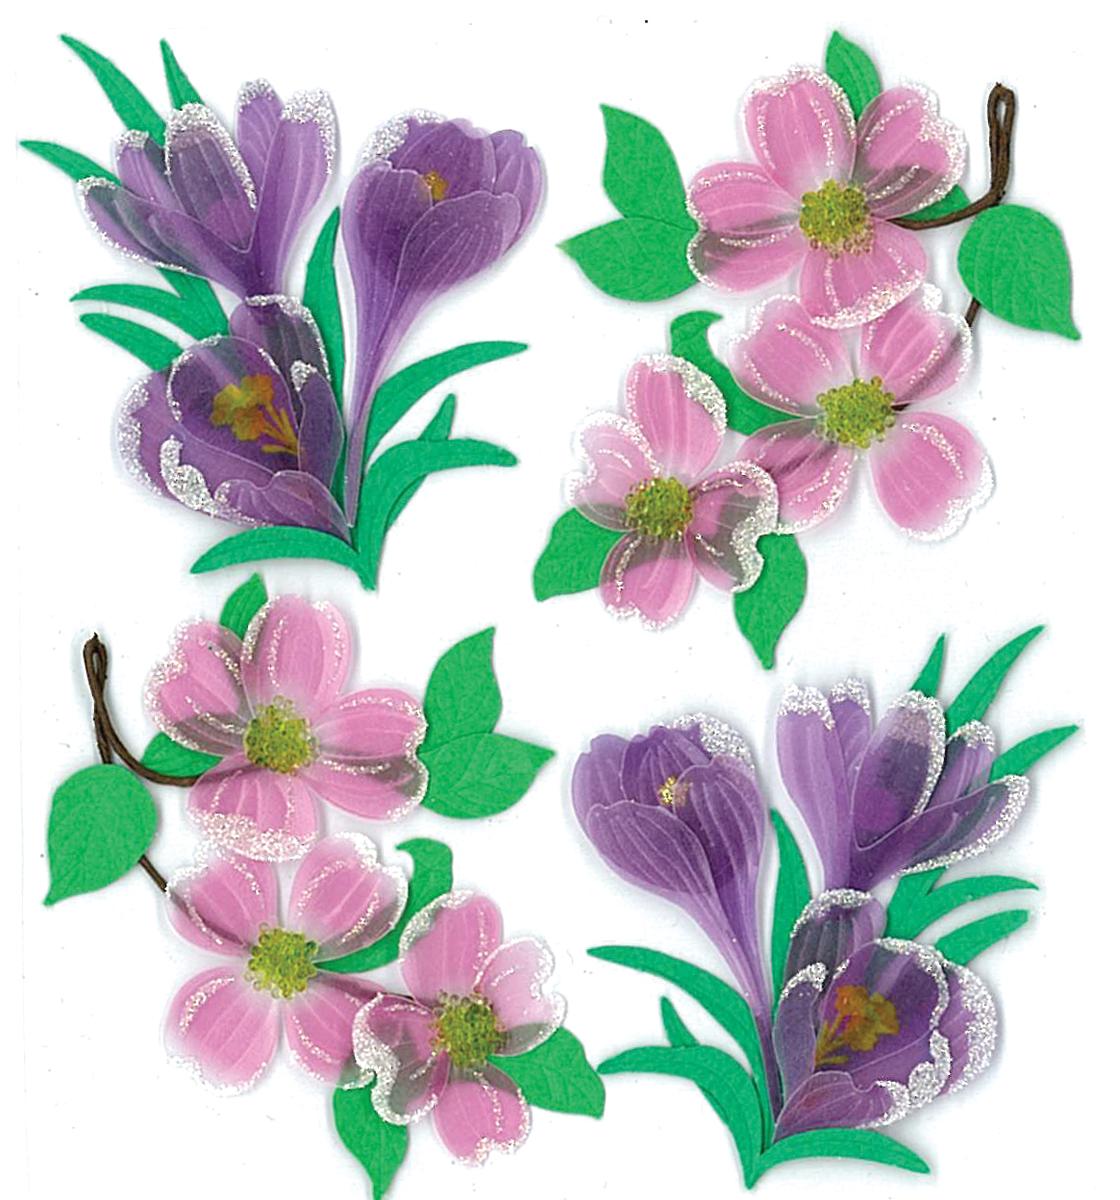 Jolee's Boutique Dimensional Stickers-Dogwood & Crocus Flowers